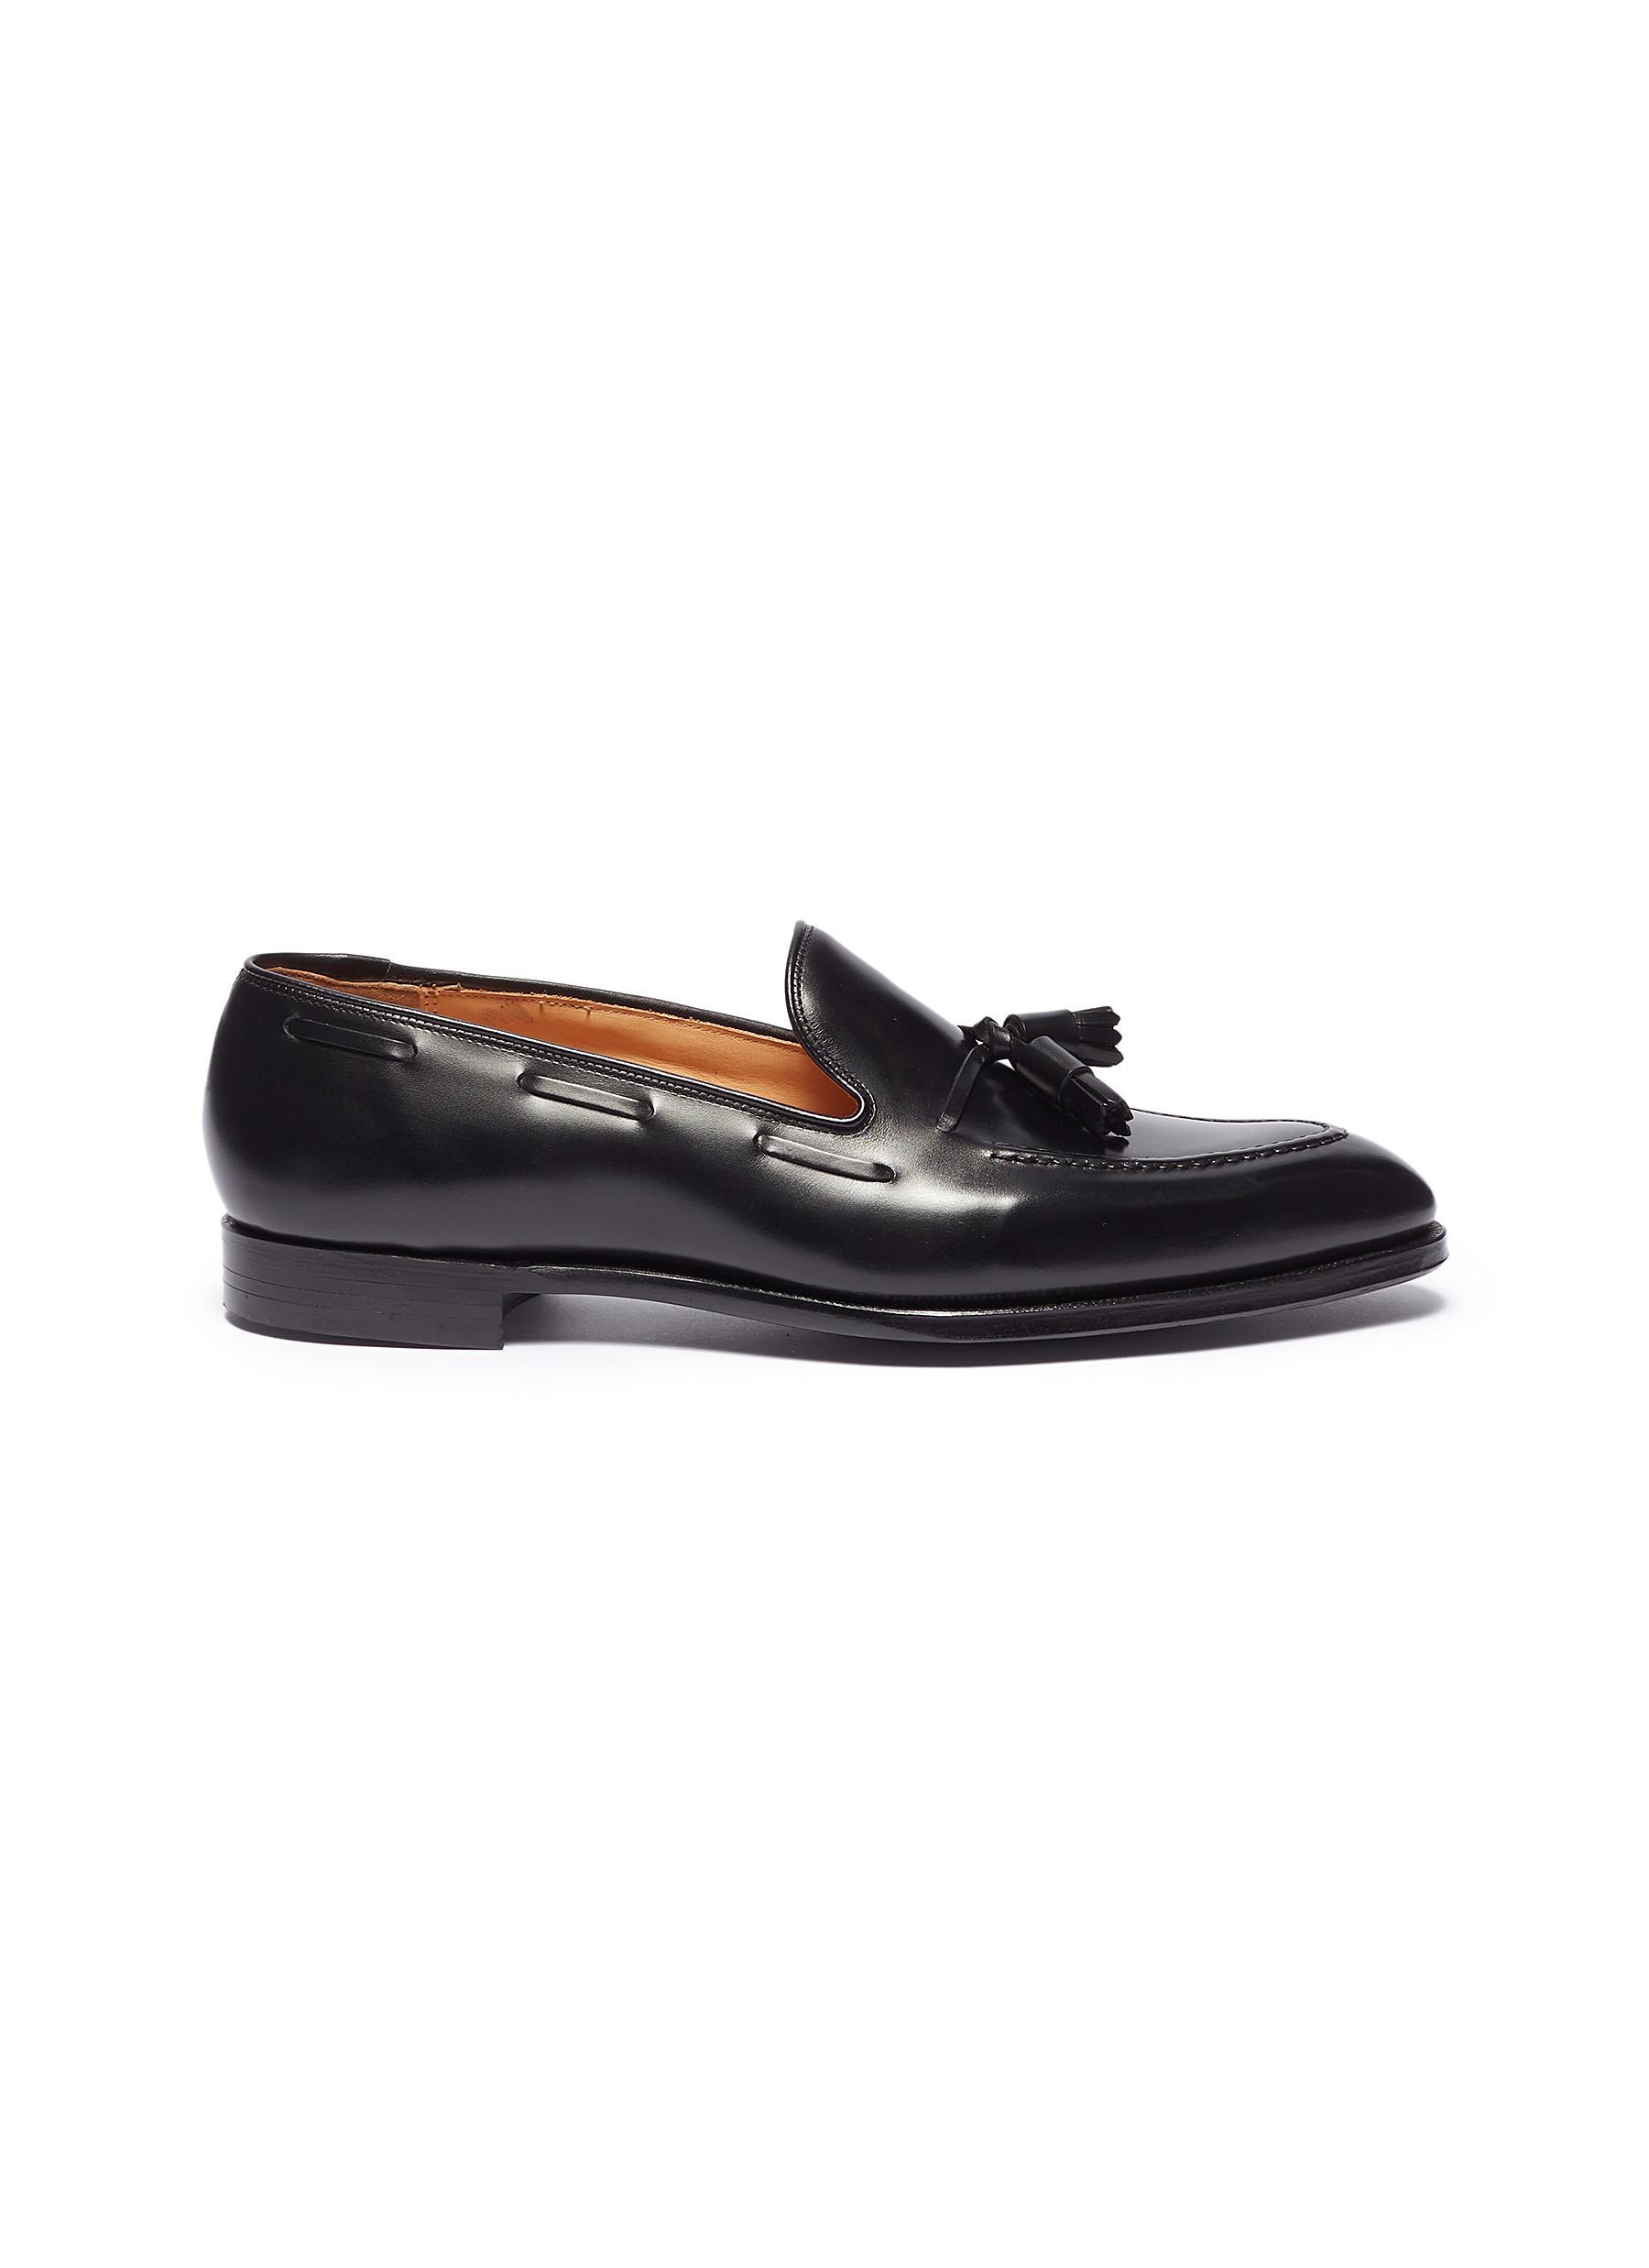 'Adrian' tassel leather loafers